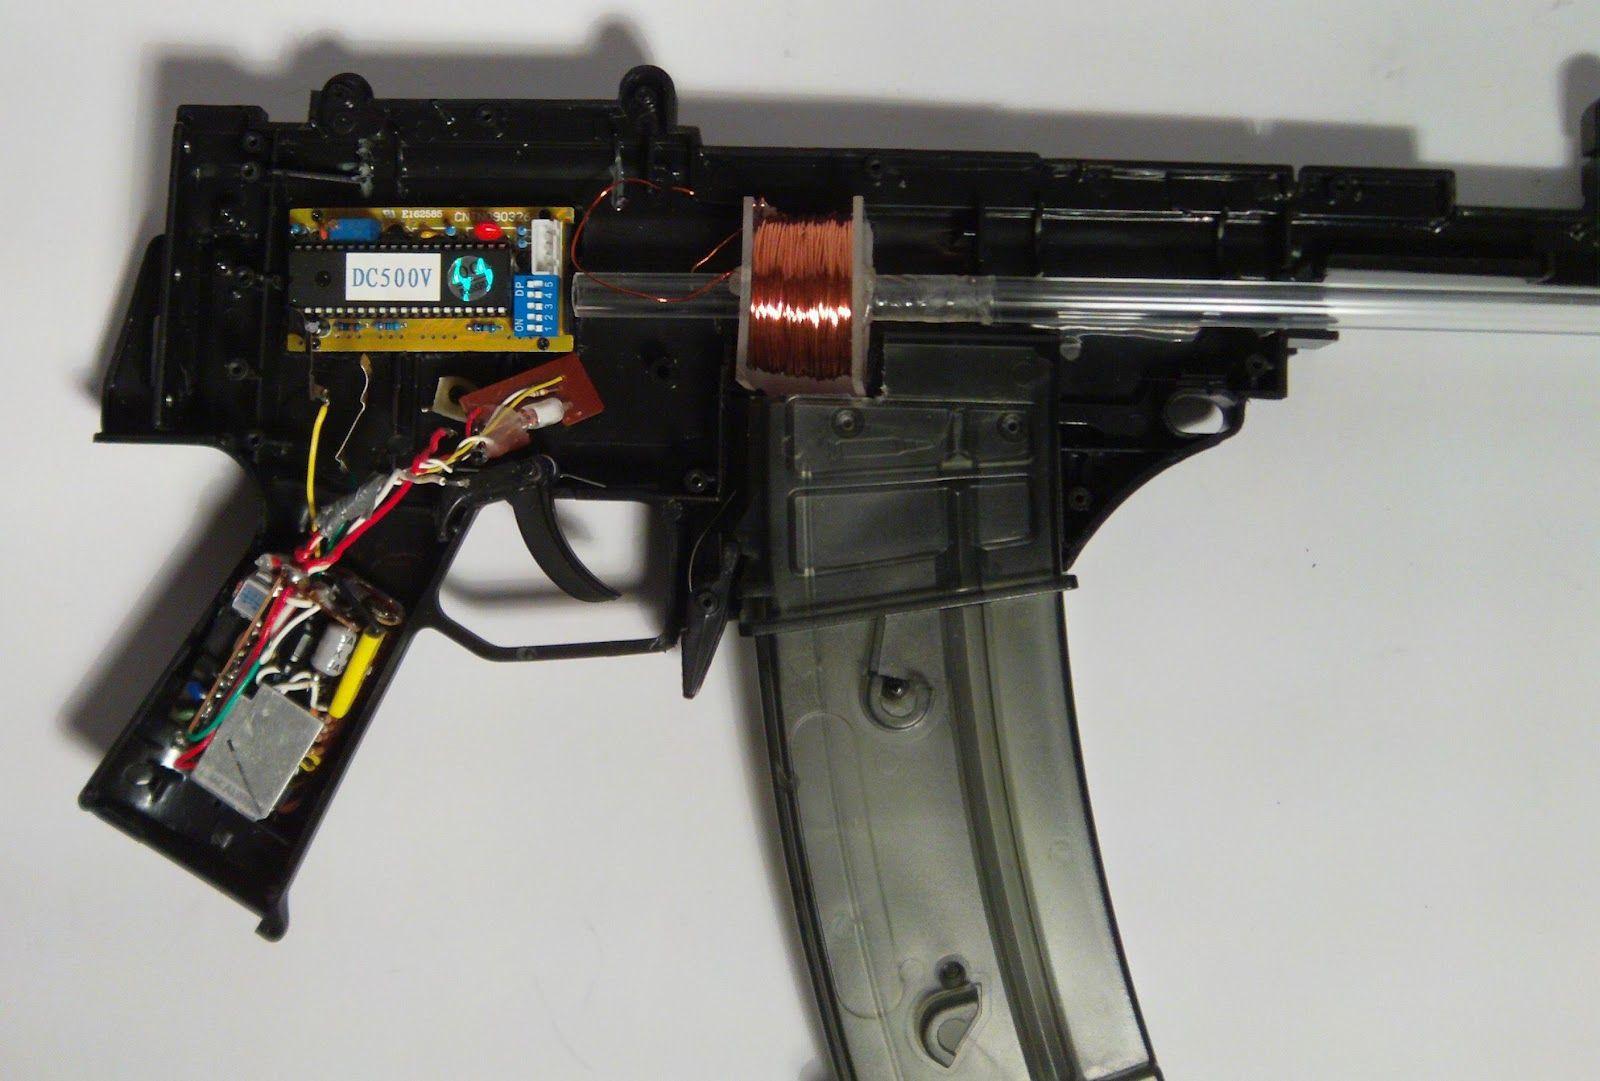 Pin by J.C. Reyes on survival | Diy tech, Electrical ... Gun Diagrams Schematics G on